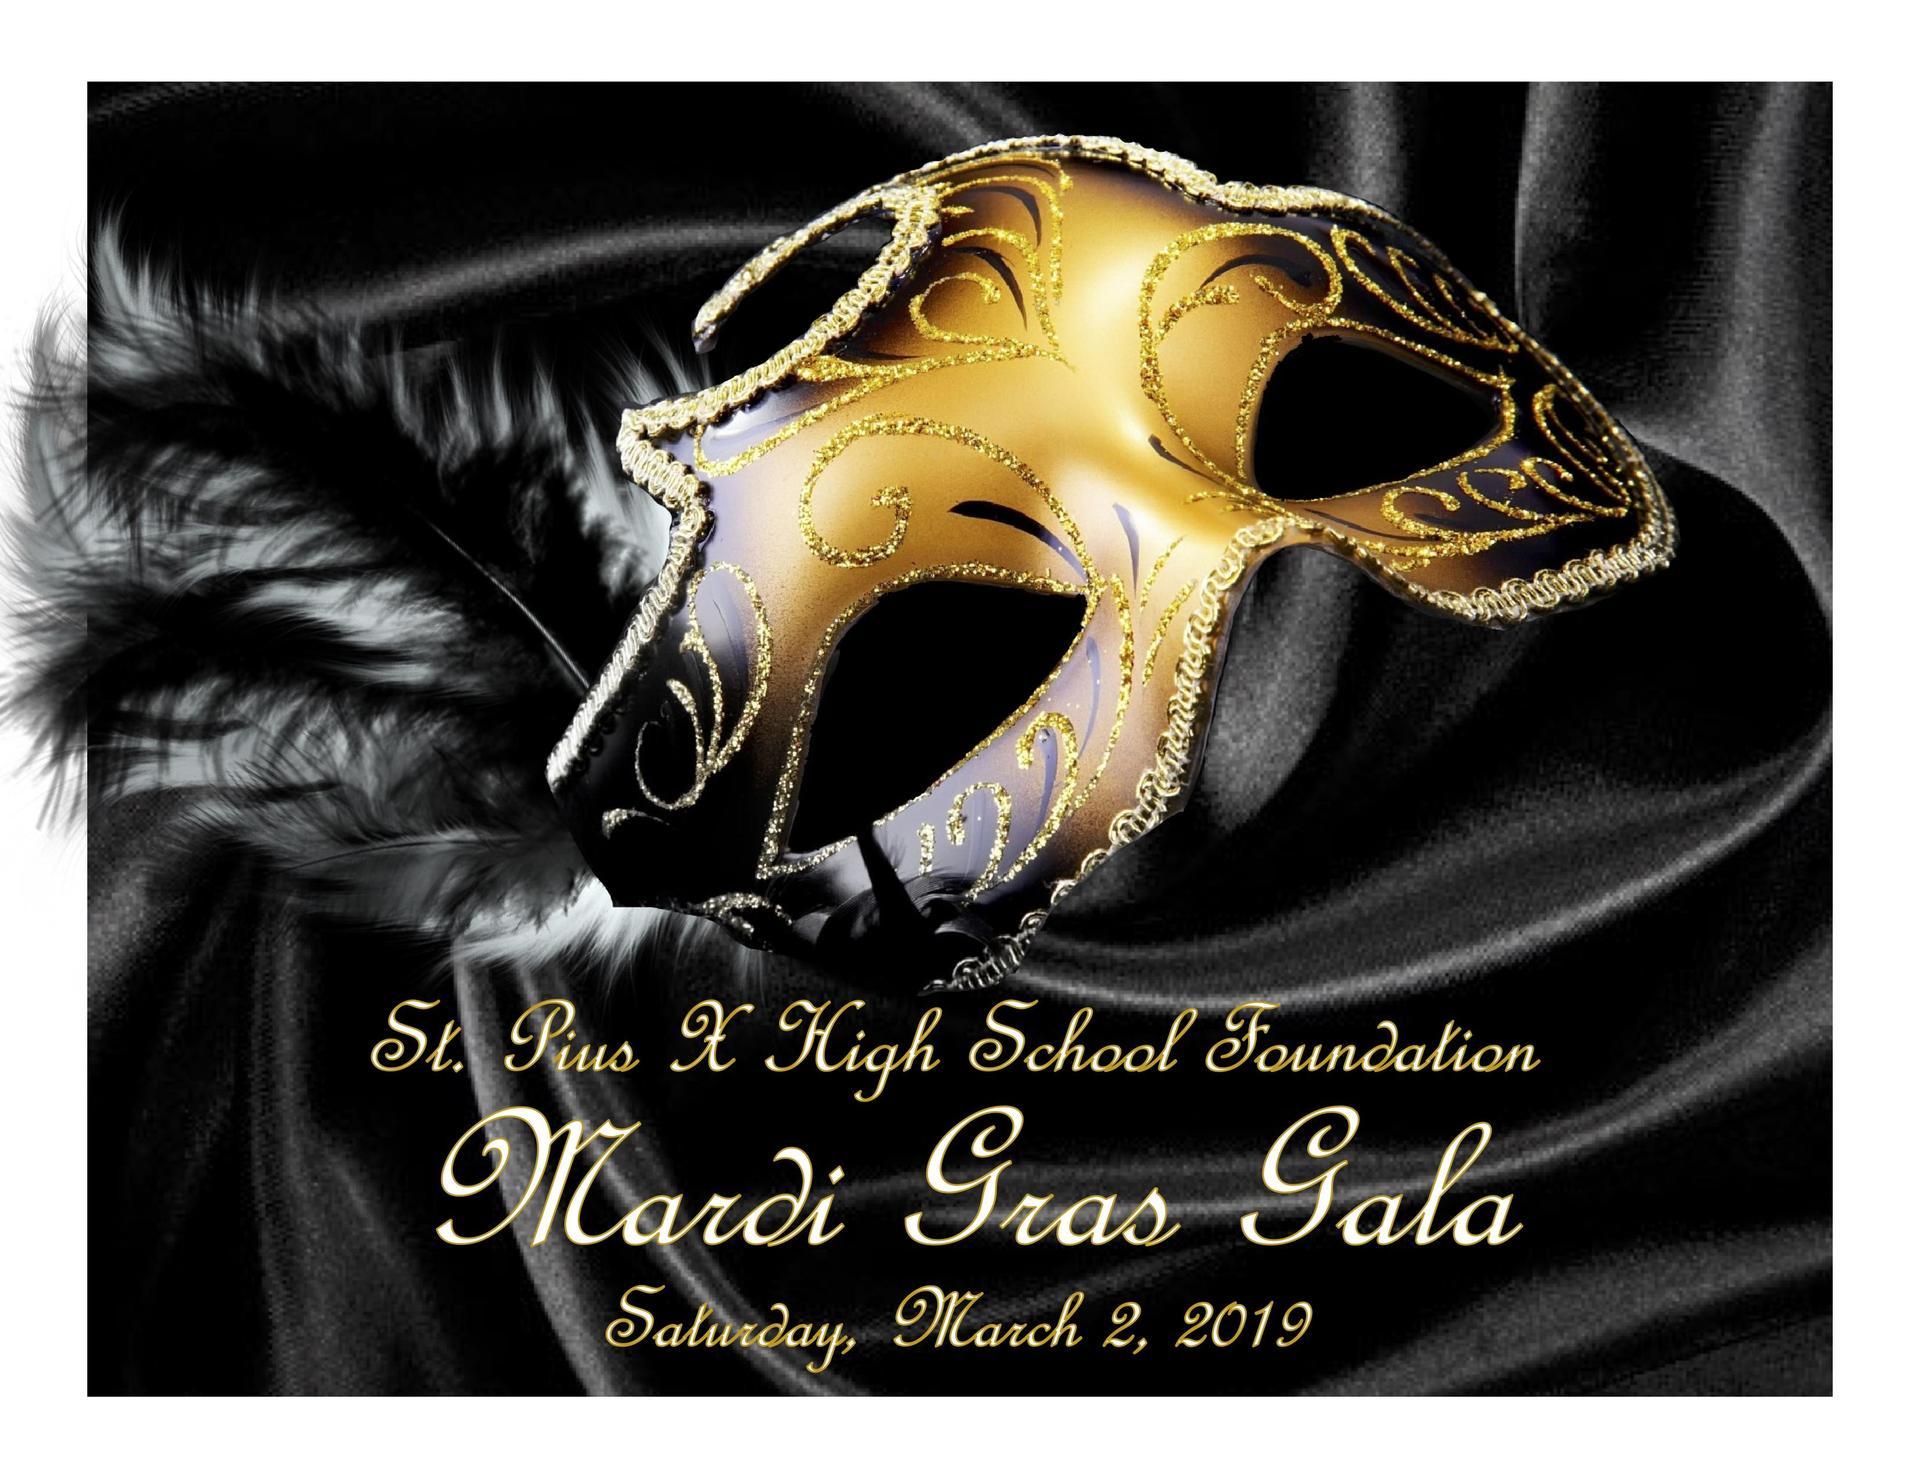 Mardi Gras Gala 2019